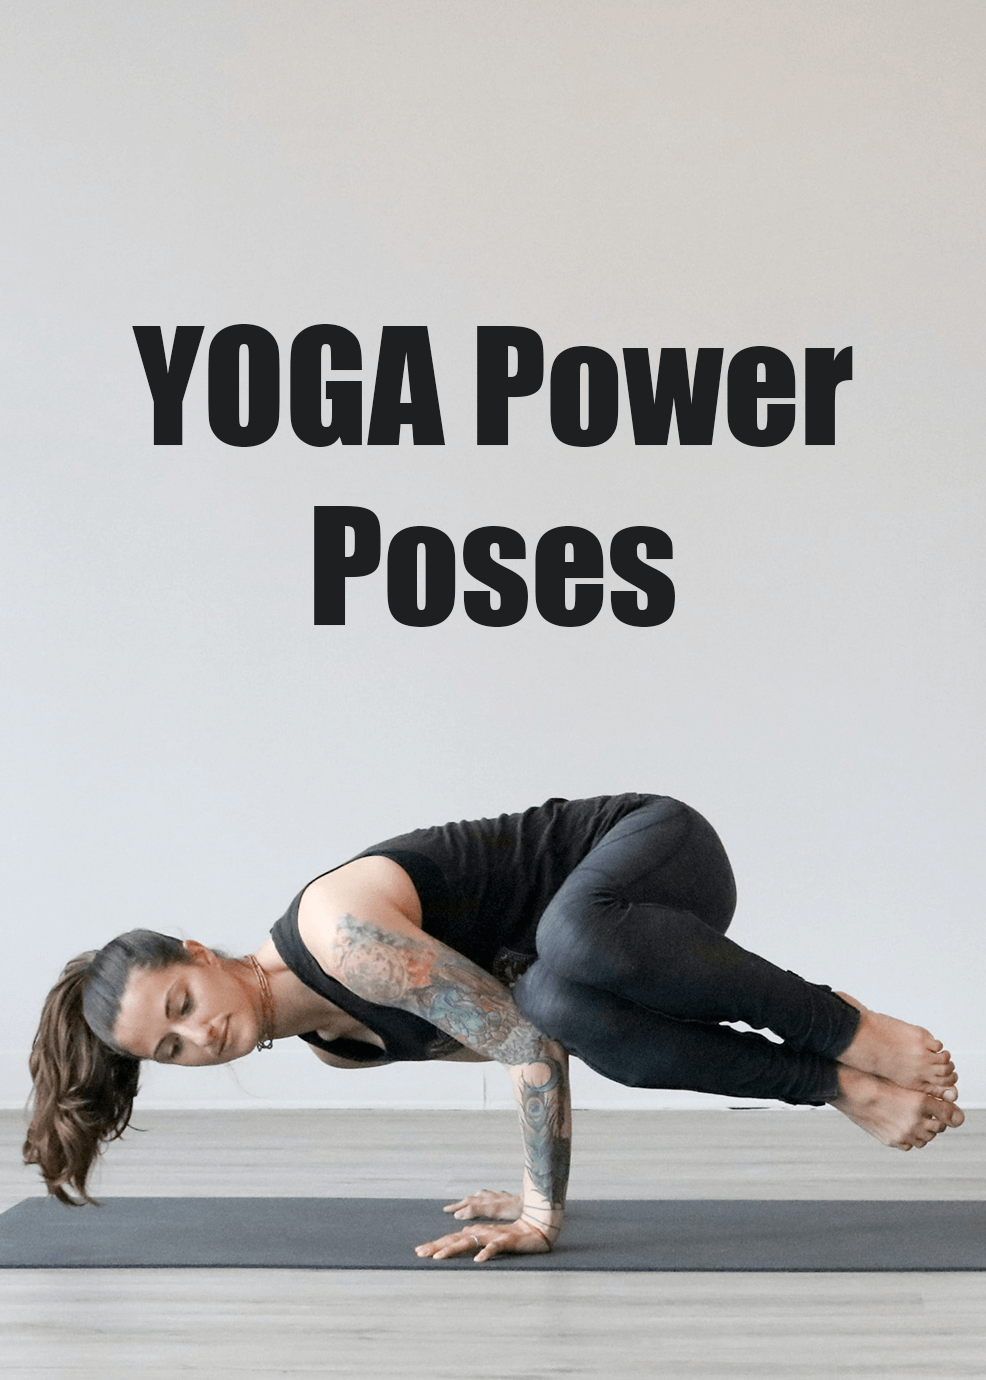 Yoga Power Poses